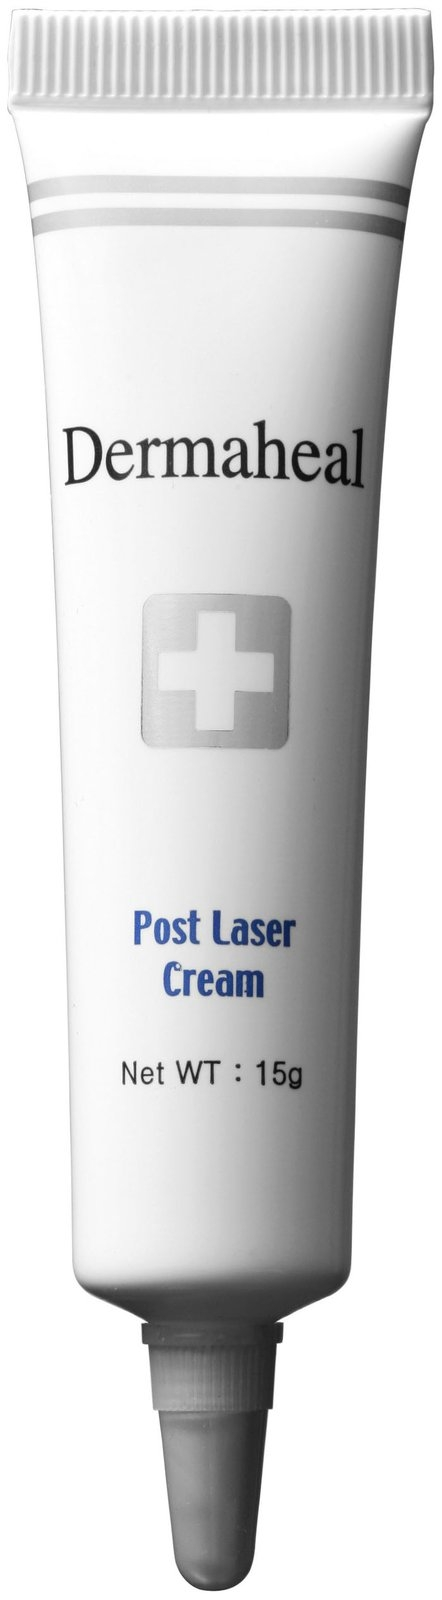 Dermaheal Крем Post Laser Cream Постпроцедурный, 15 мл